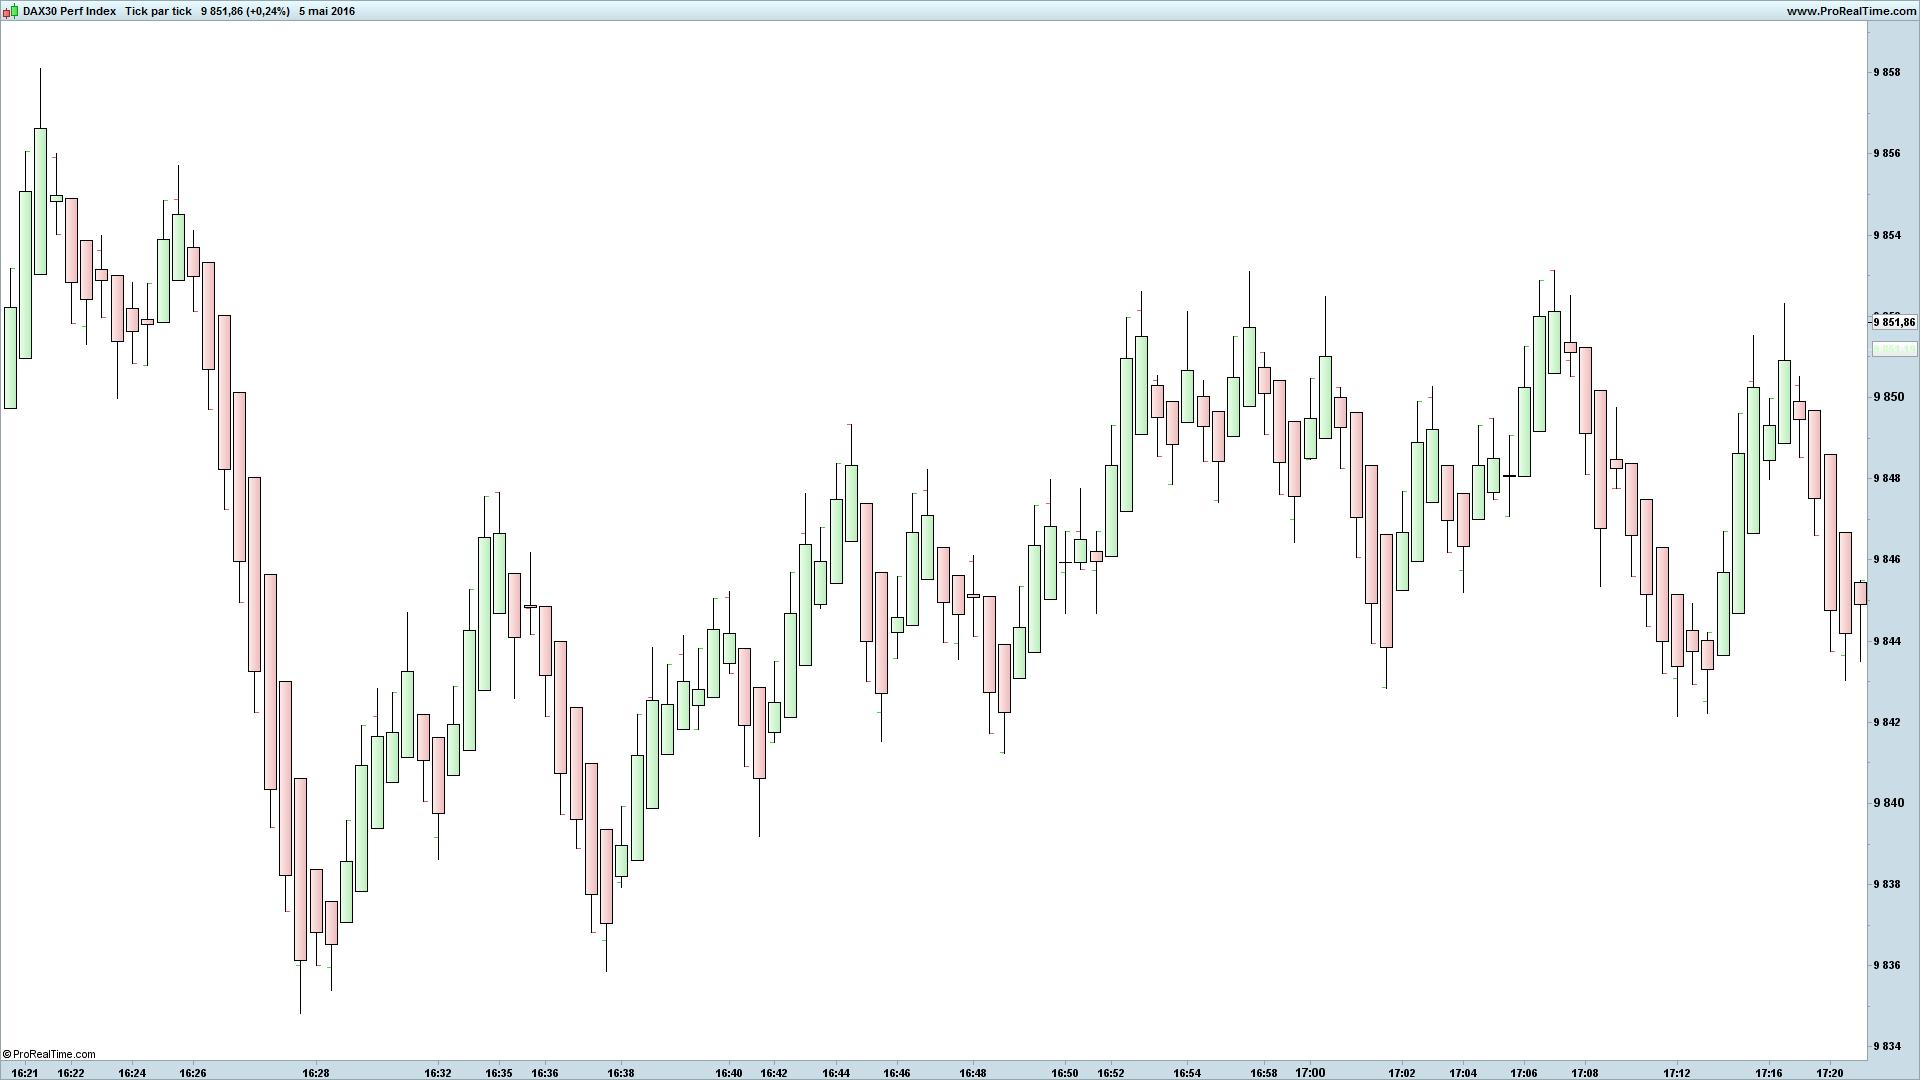 Index trading strategies